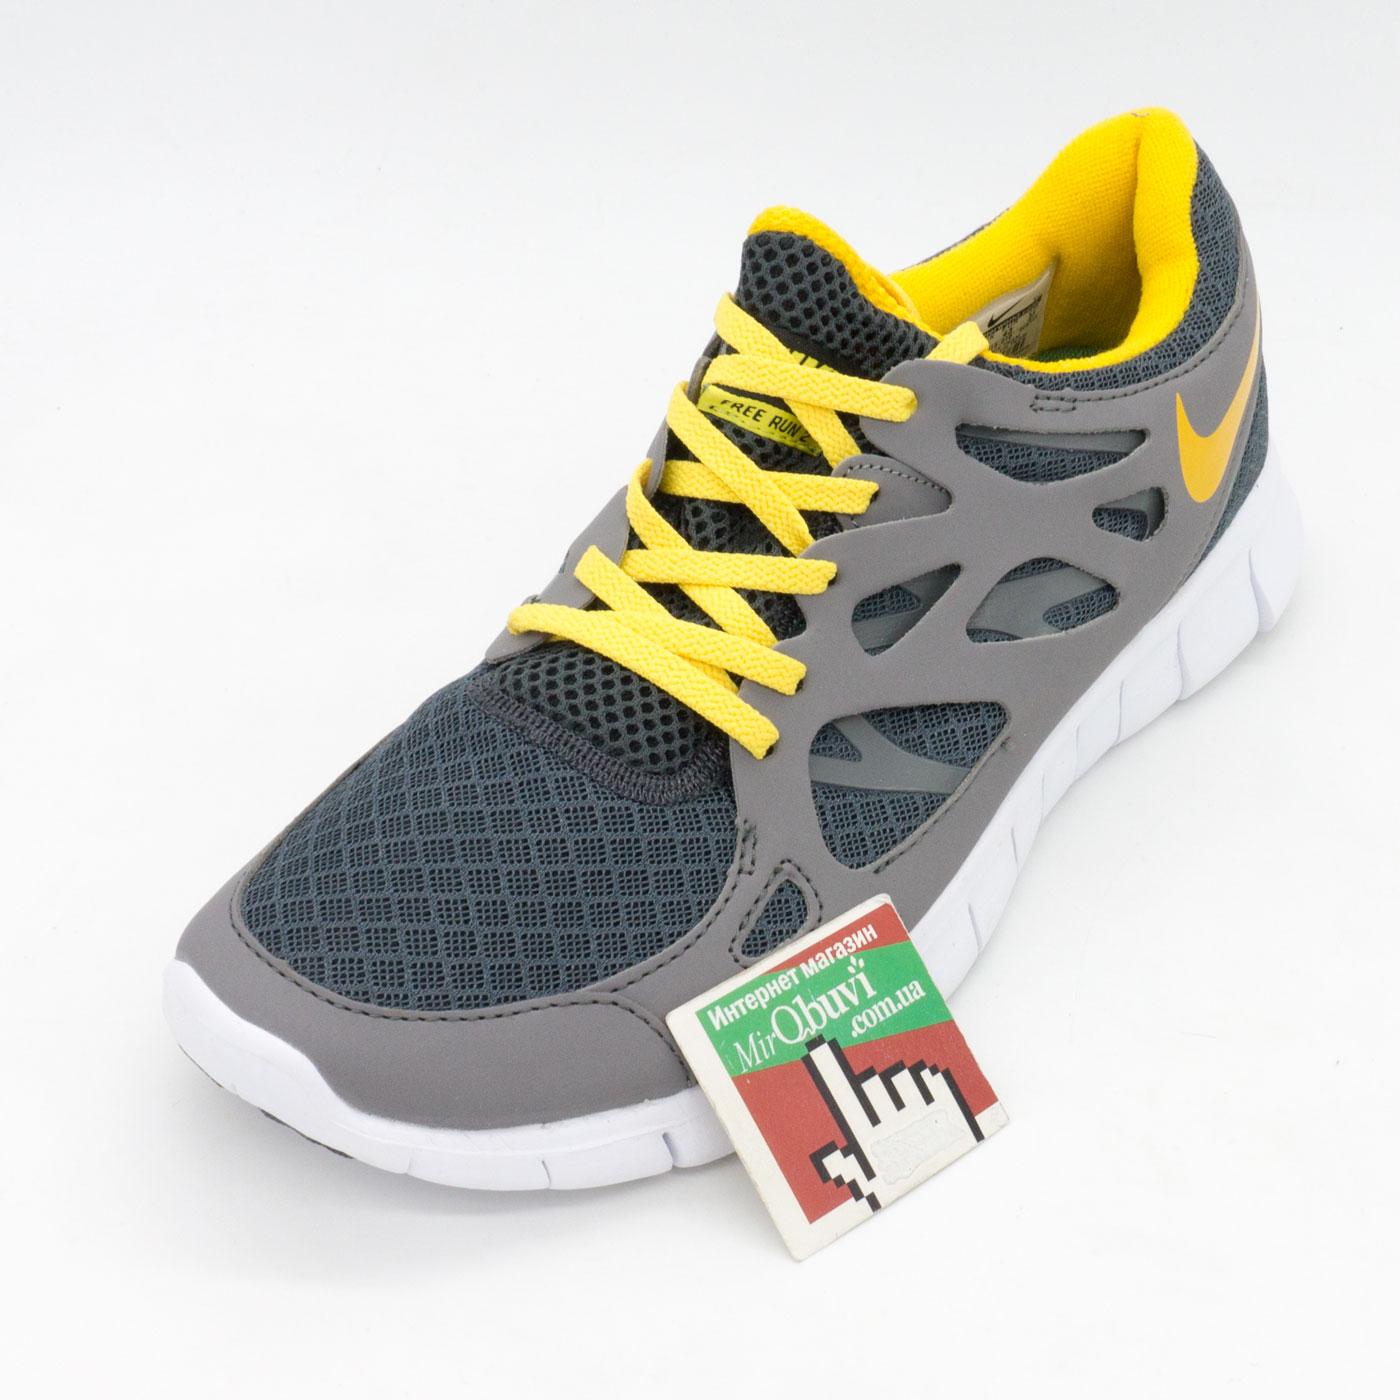 фото front Мужские кроссовки для бега Nike Free Run 2 Найк Фри Ран, серо-желтые front